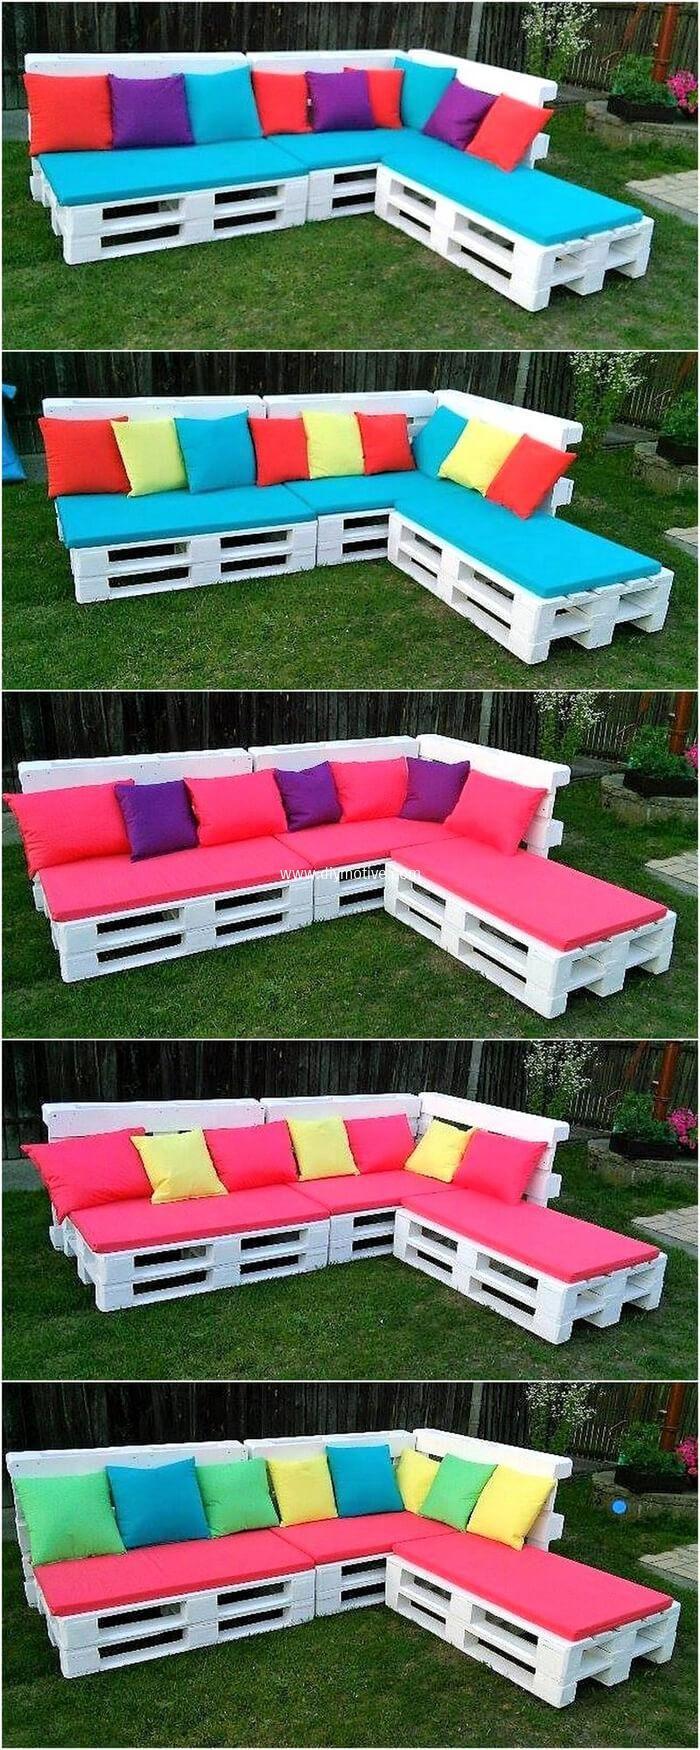 Cheap Wood Pallet Ideas To Remodel Your Home Mebel Iz Poddonov Proekty Svoimi Rukami Domashnij Dizajn